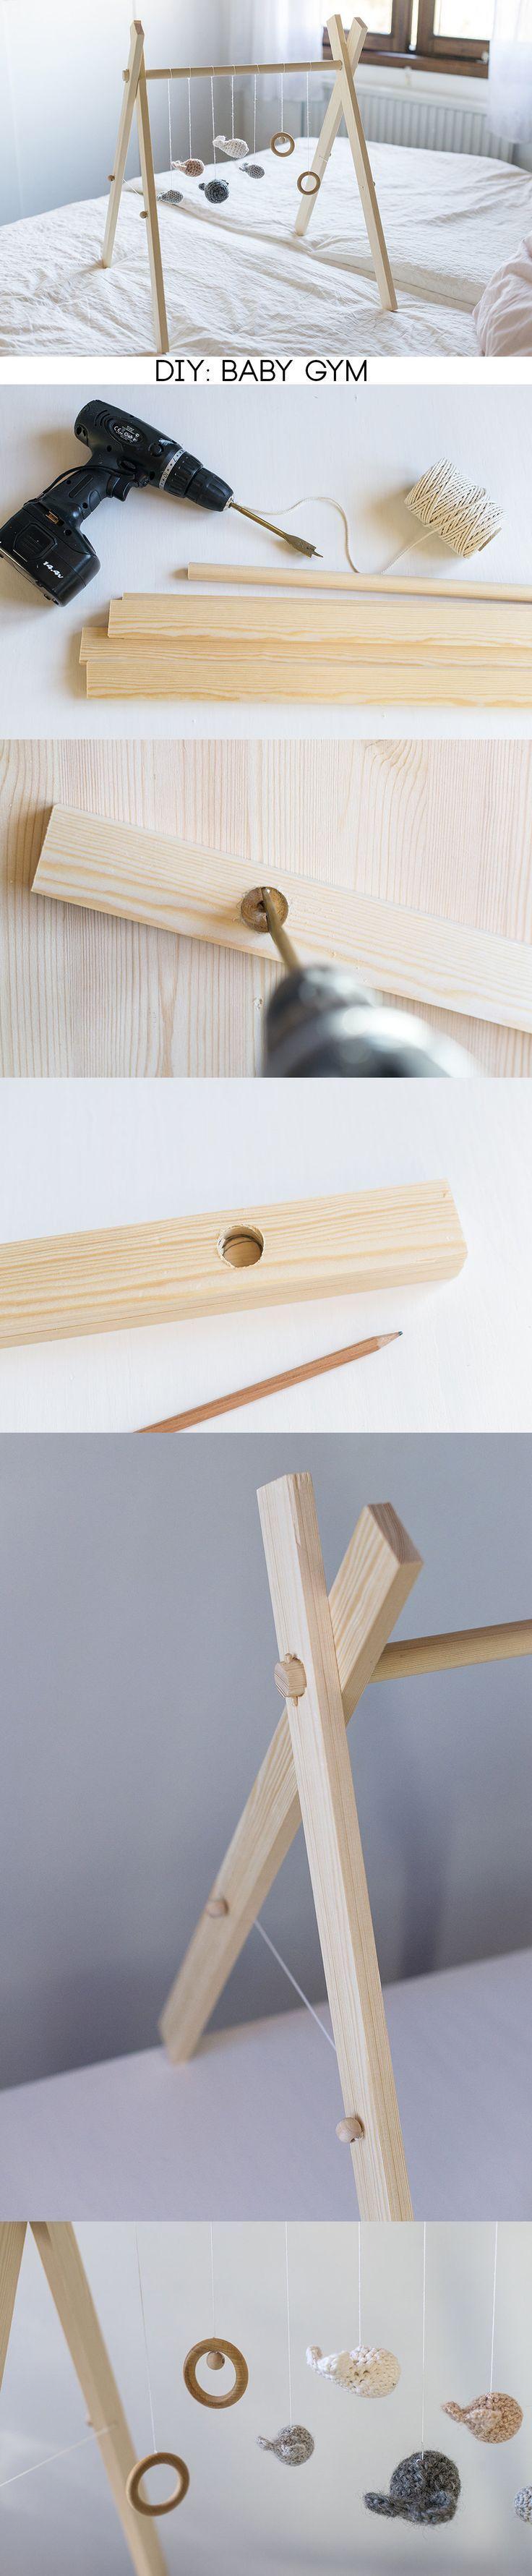 toys DIY wooden